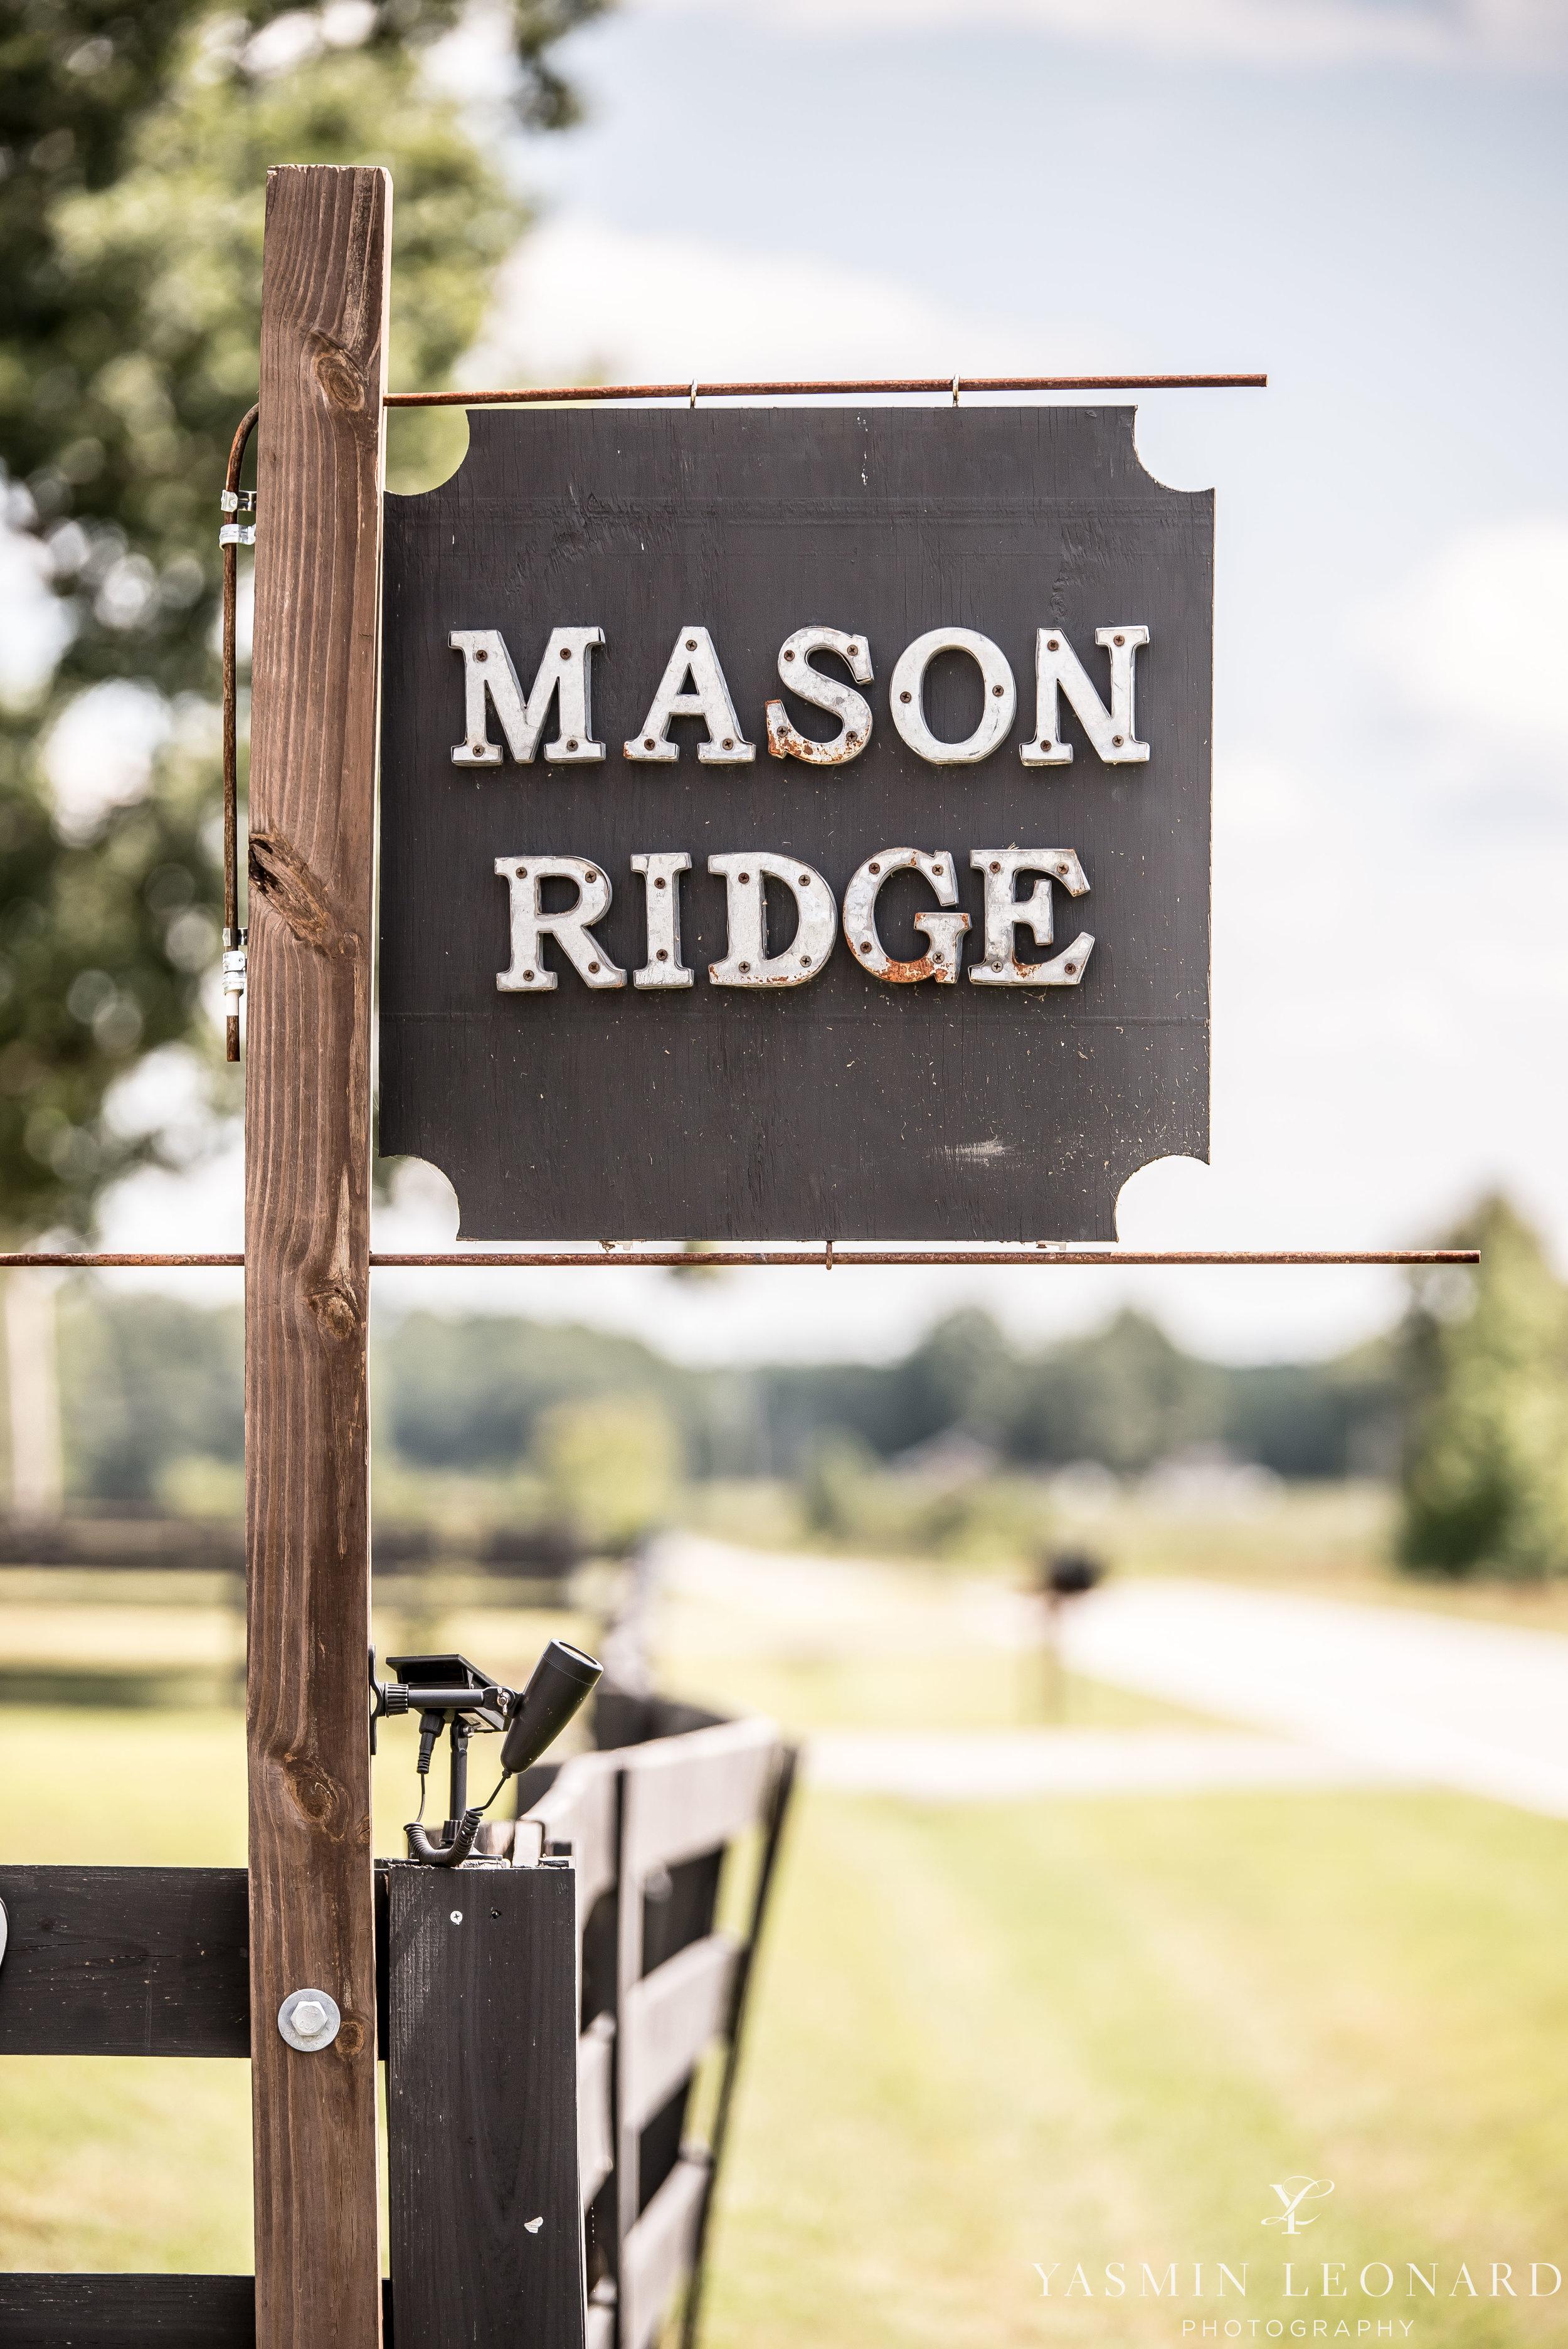 Mason Ridge   Liberty, NC   Aylissa and John   Yasmin Leonard Photography-11.jpg